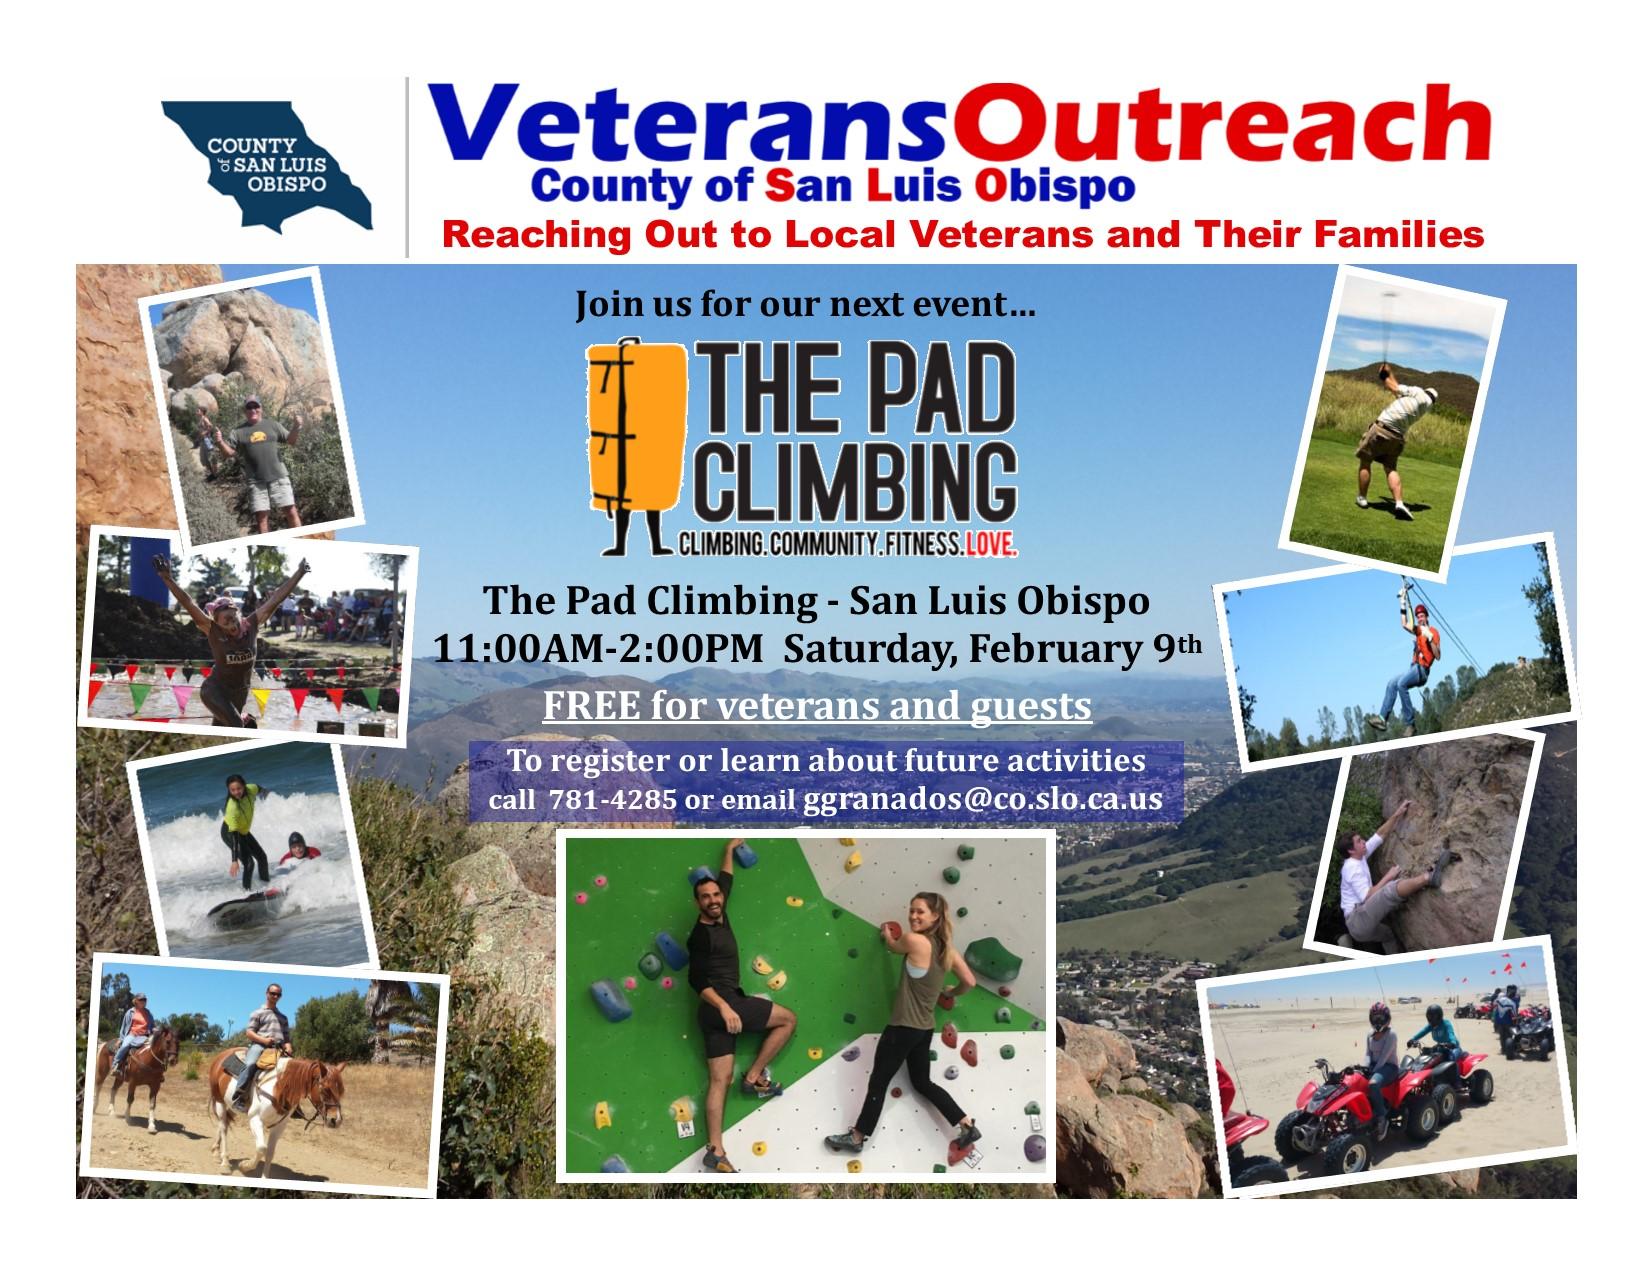 Climbing event information